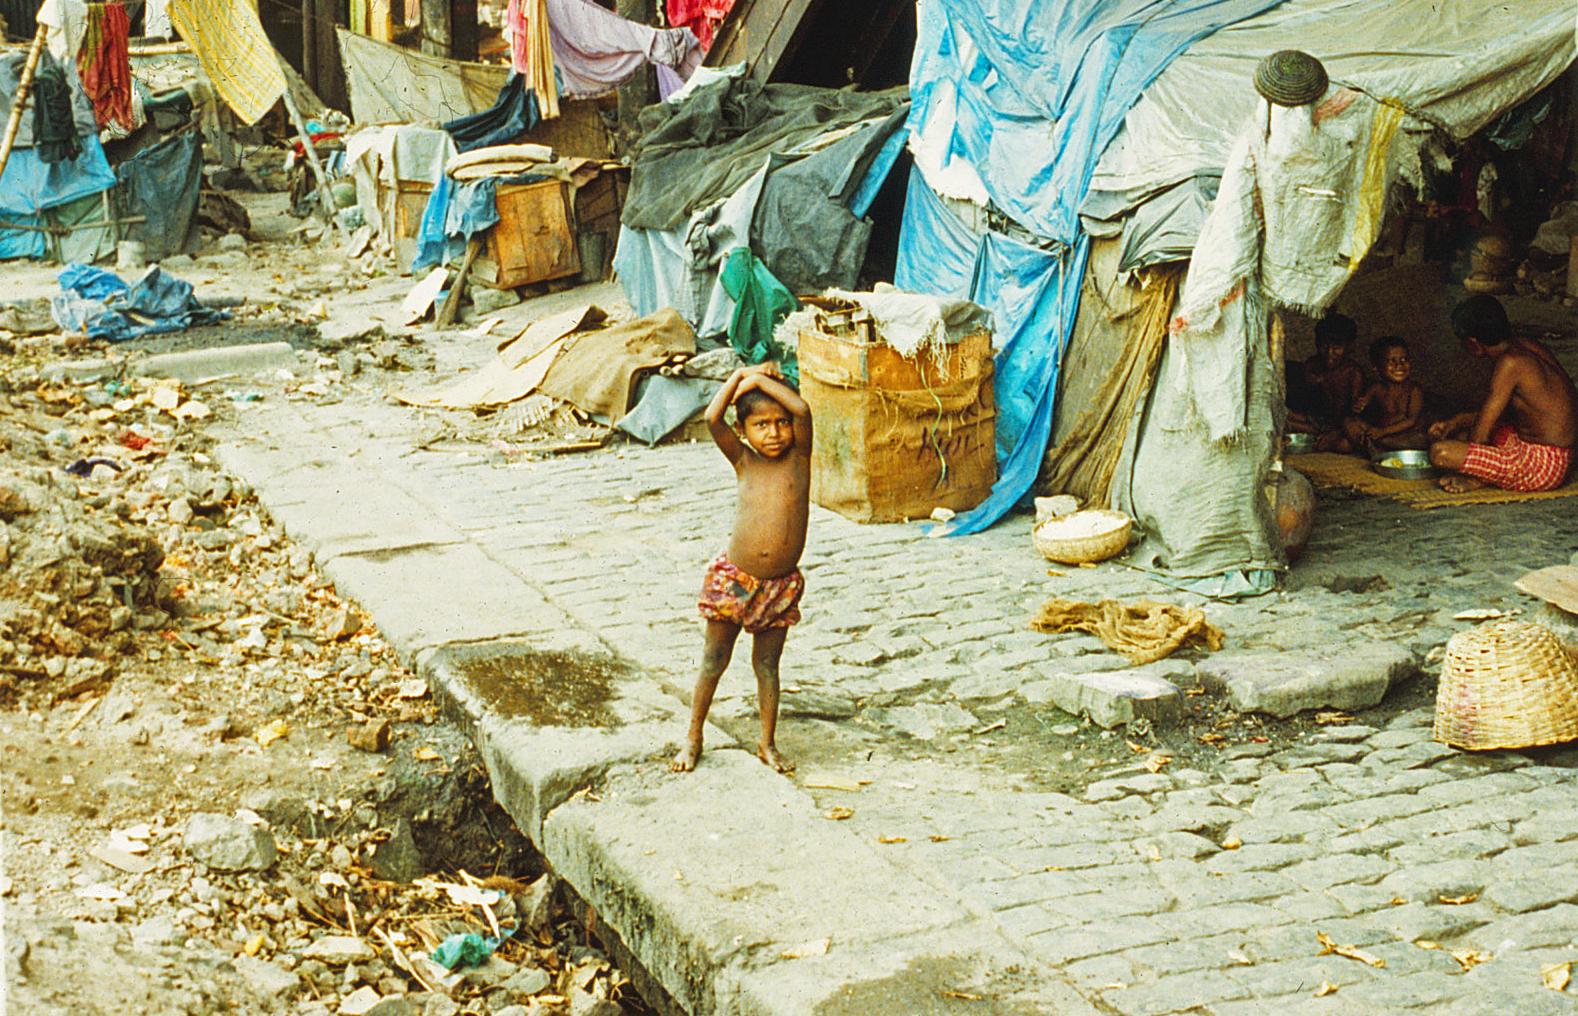 Surat-India-where-Plague-starts-1994--LG-(deleted-4db1da69-93acec-9b44d907).jpg